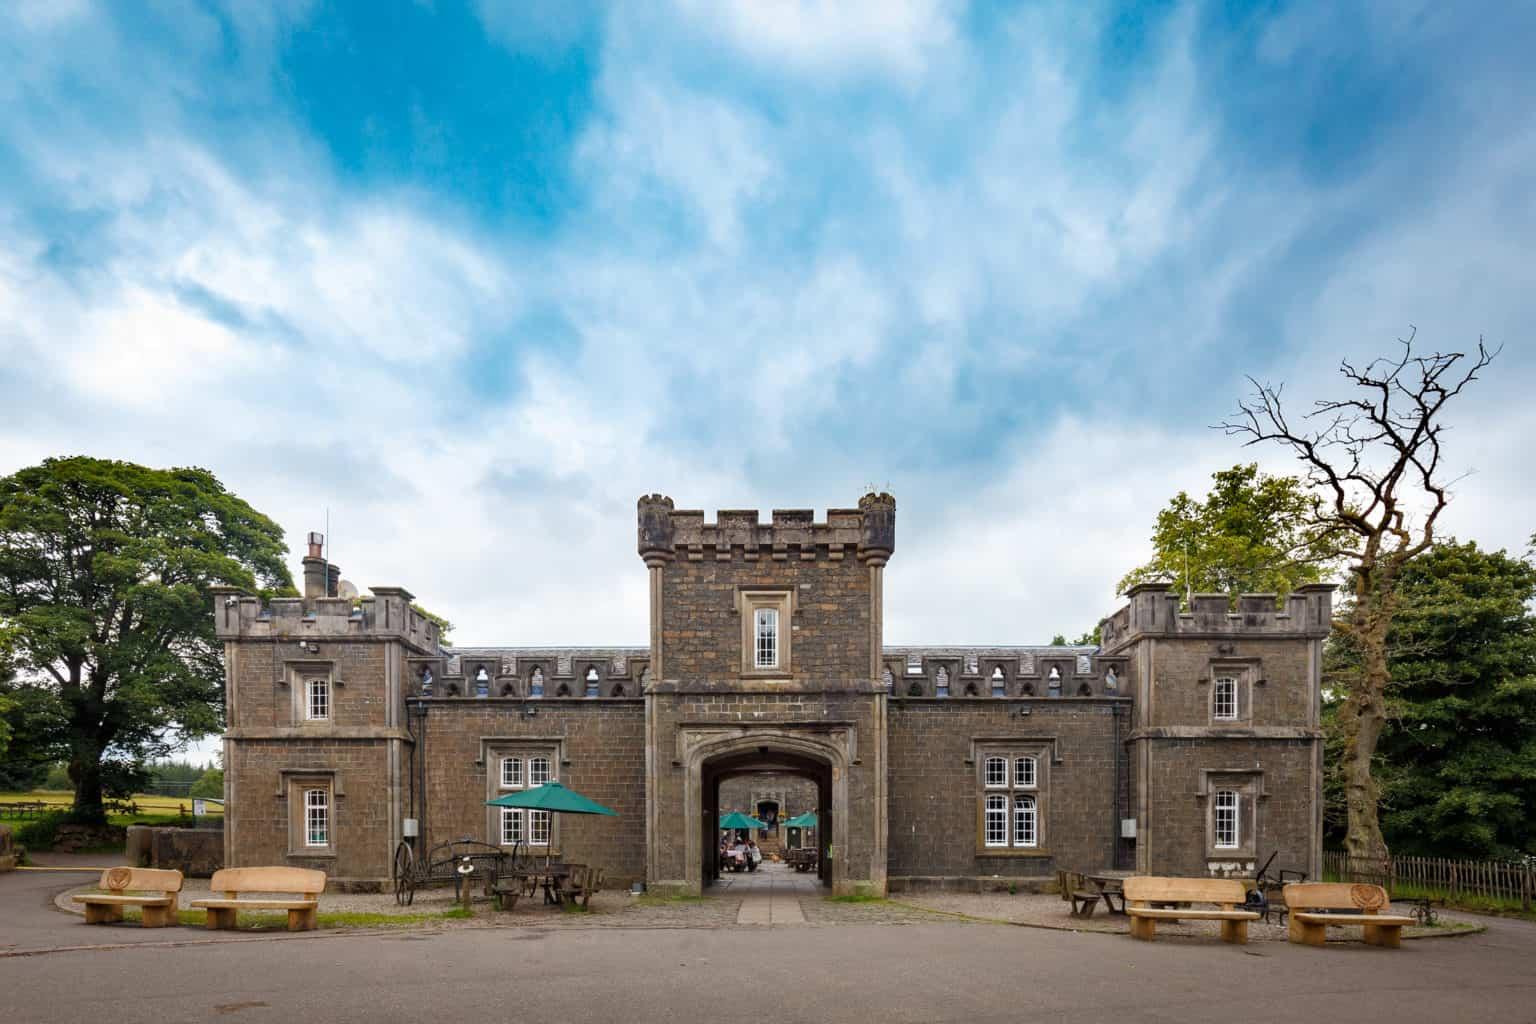 Mugdock Castle Visitors centre in Milngavie